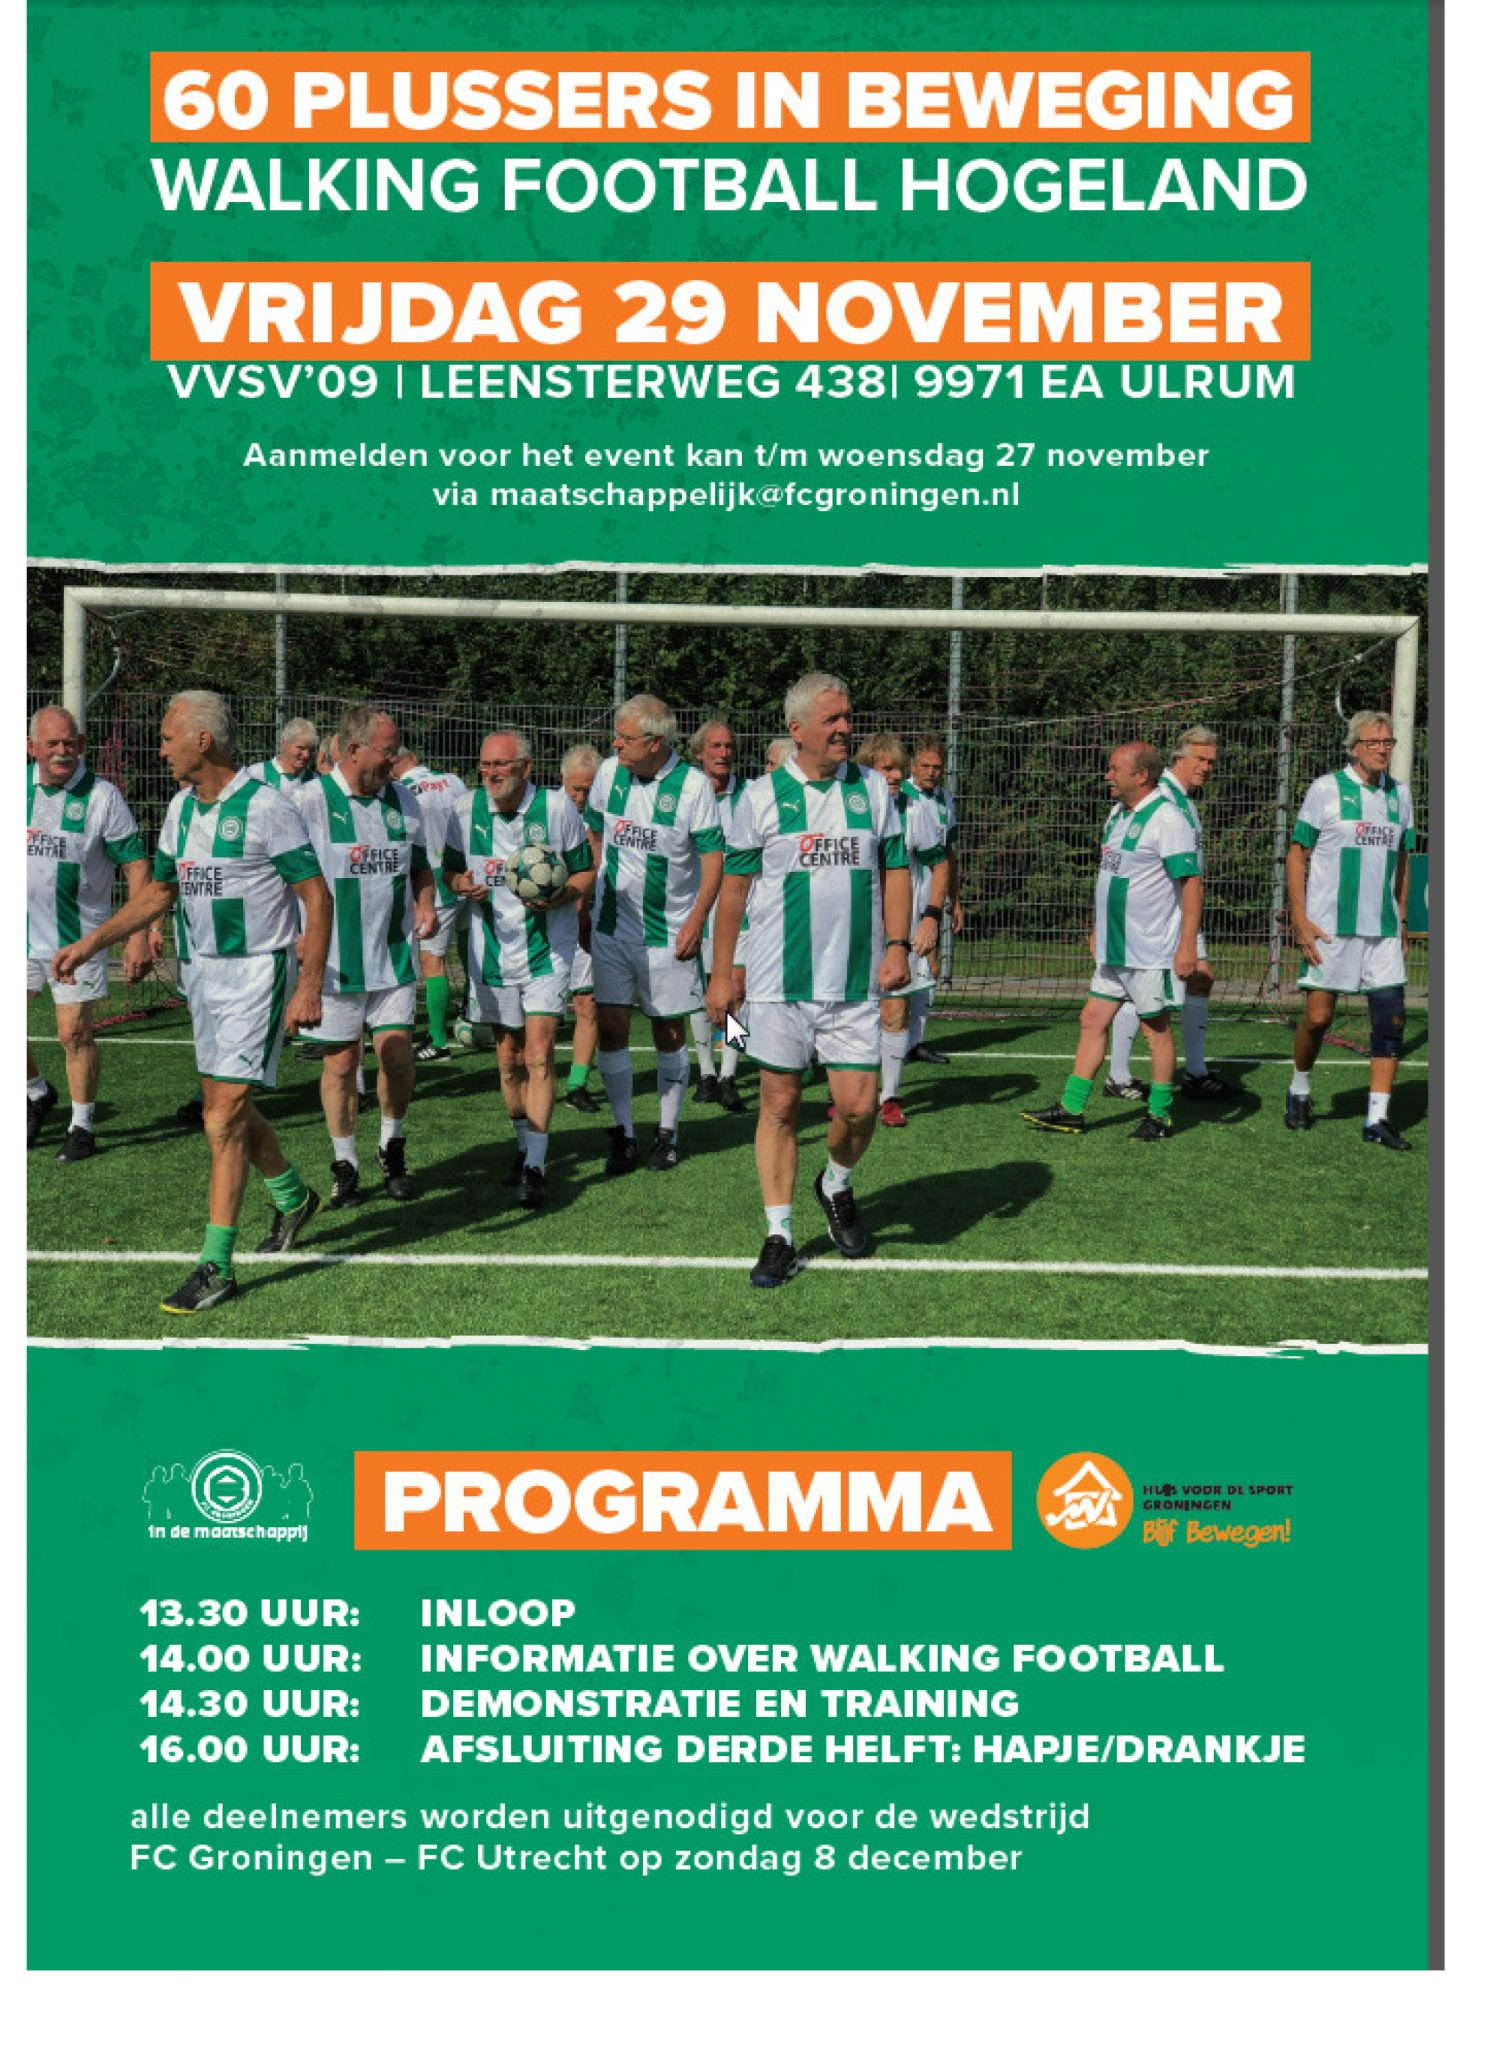 Walking Football Hogeland